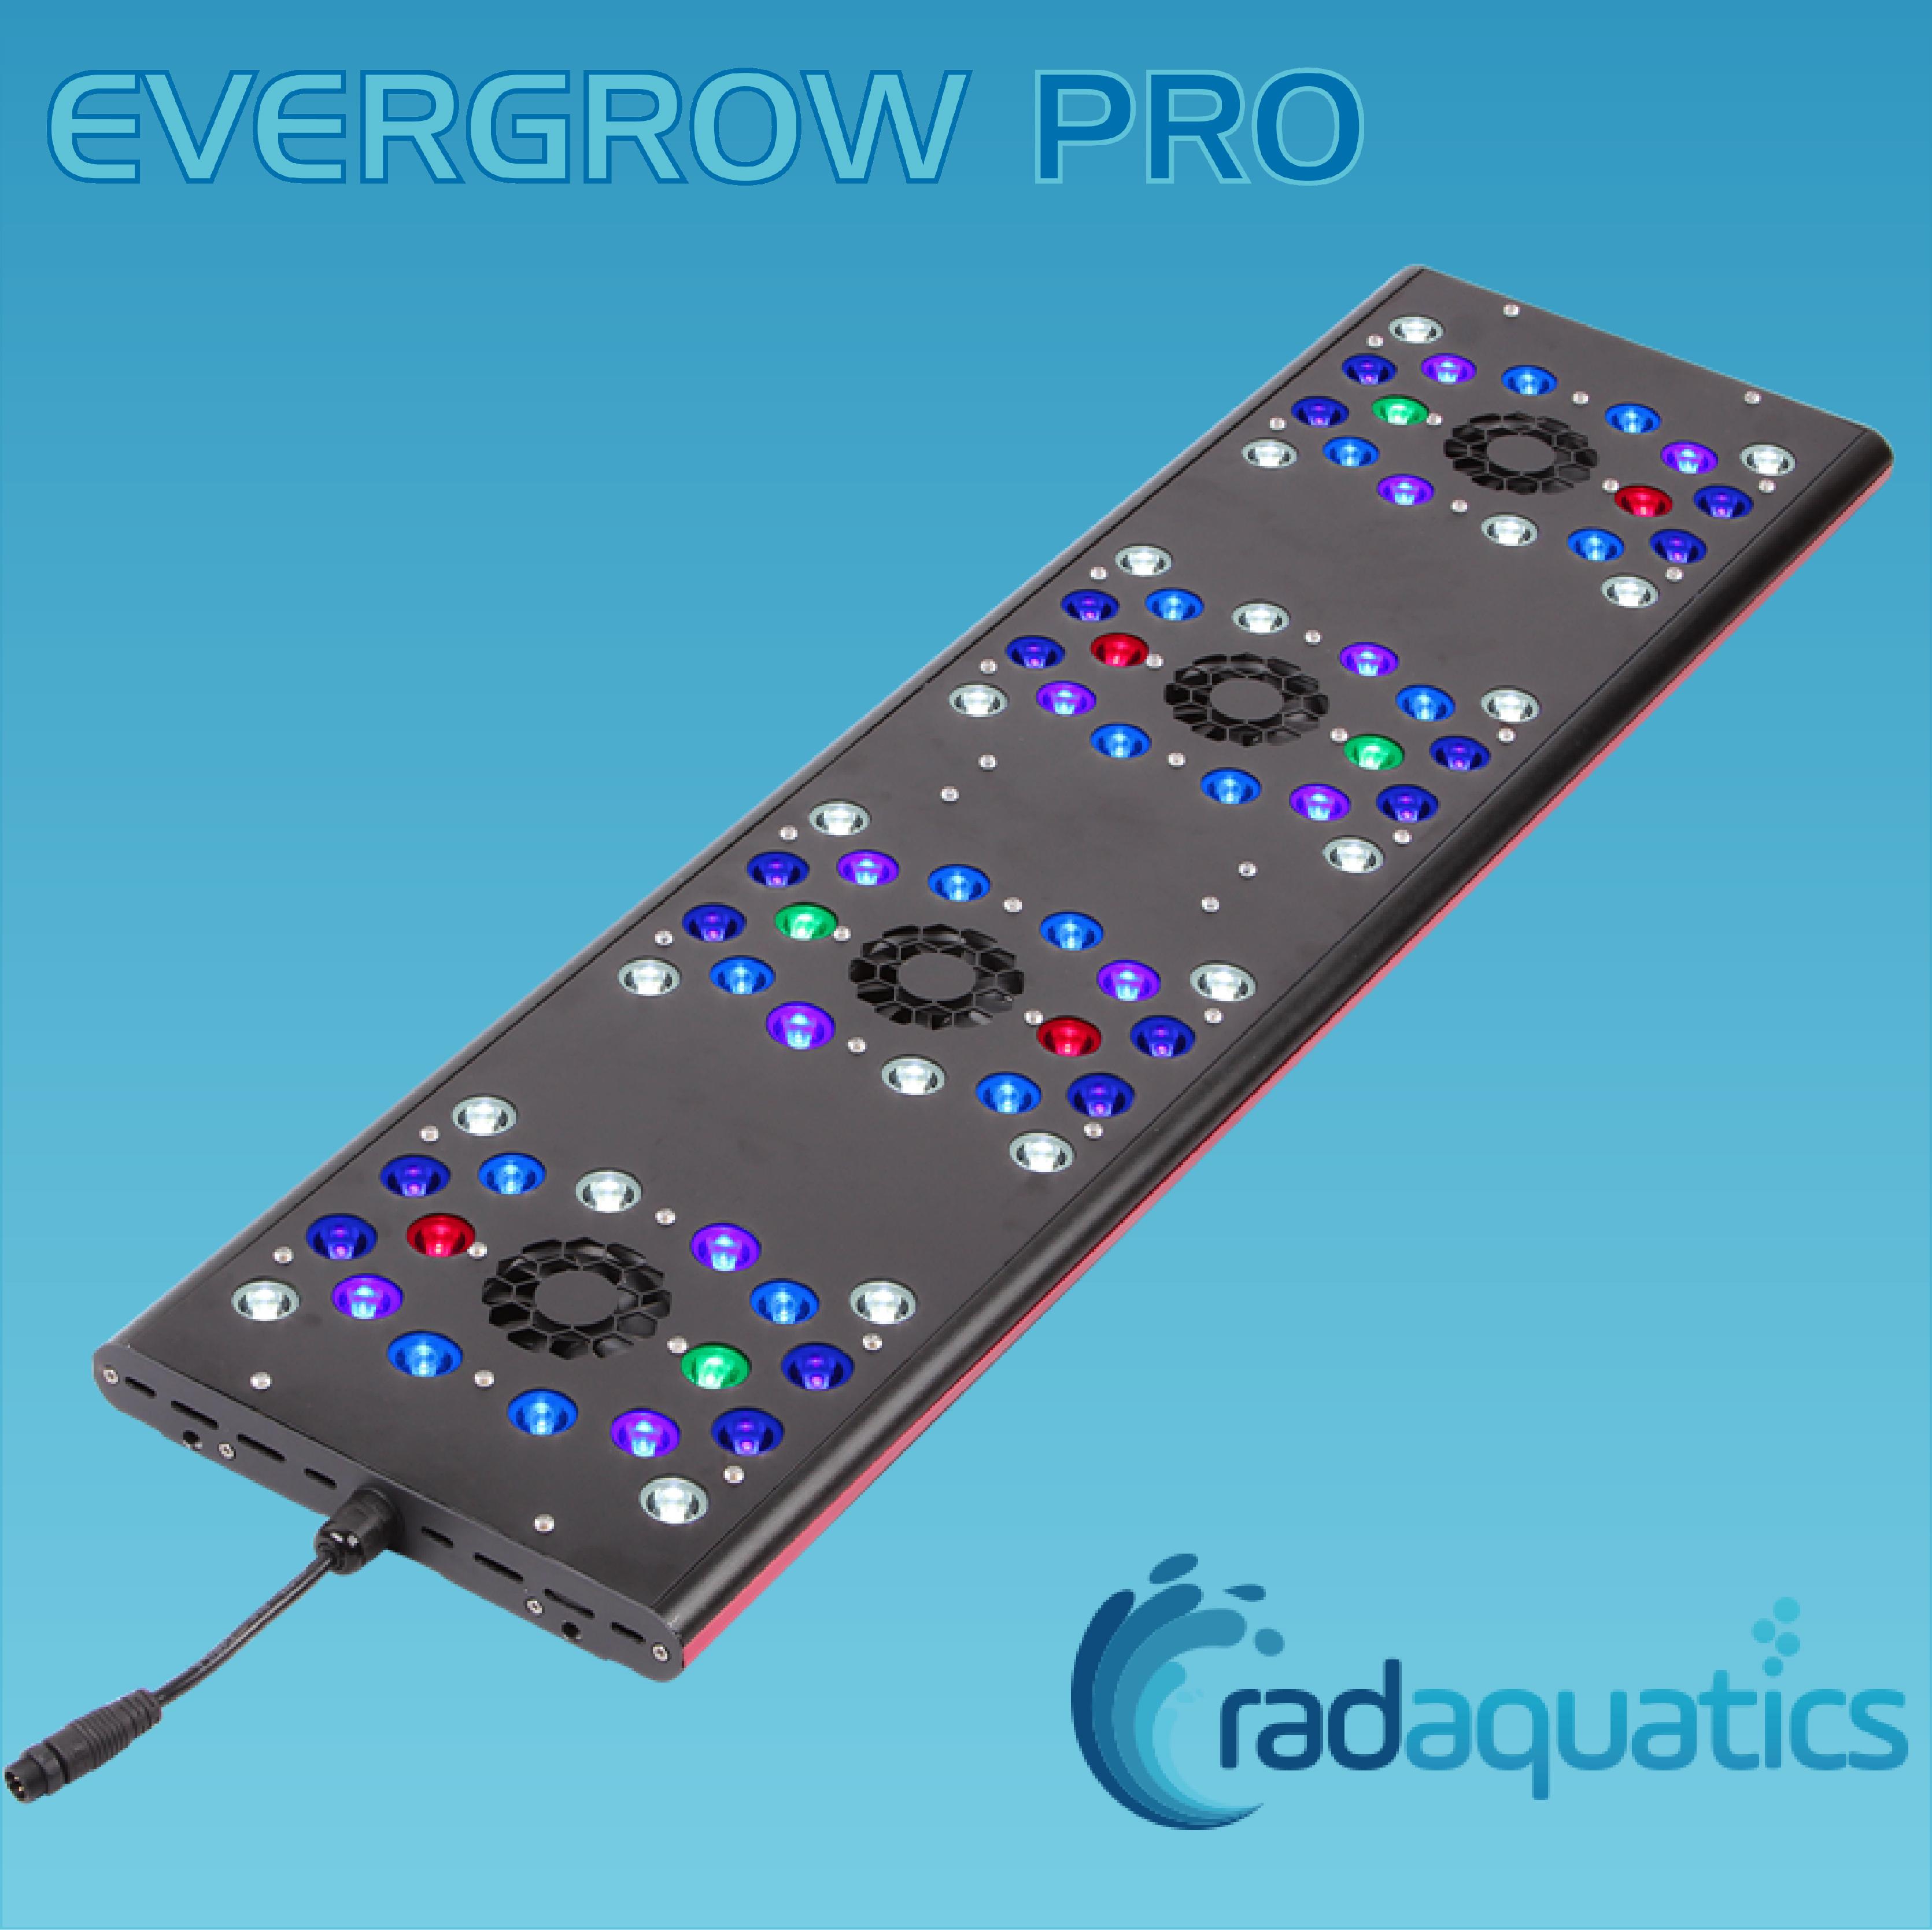 Evergrow AquaOcean IT5080 PRO